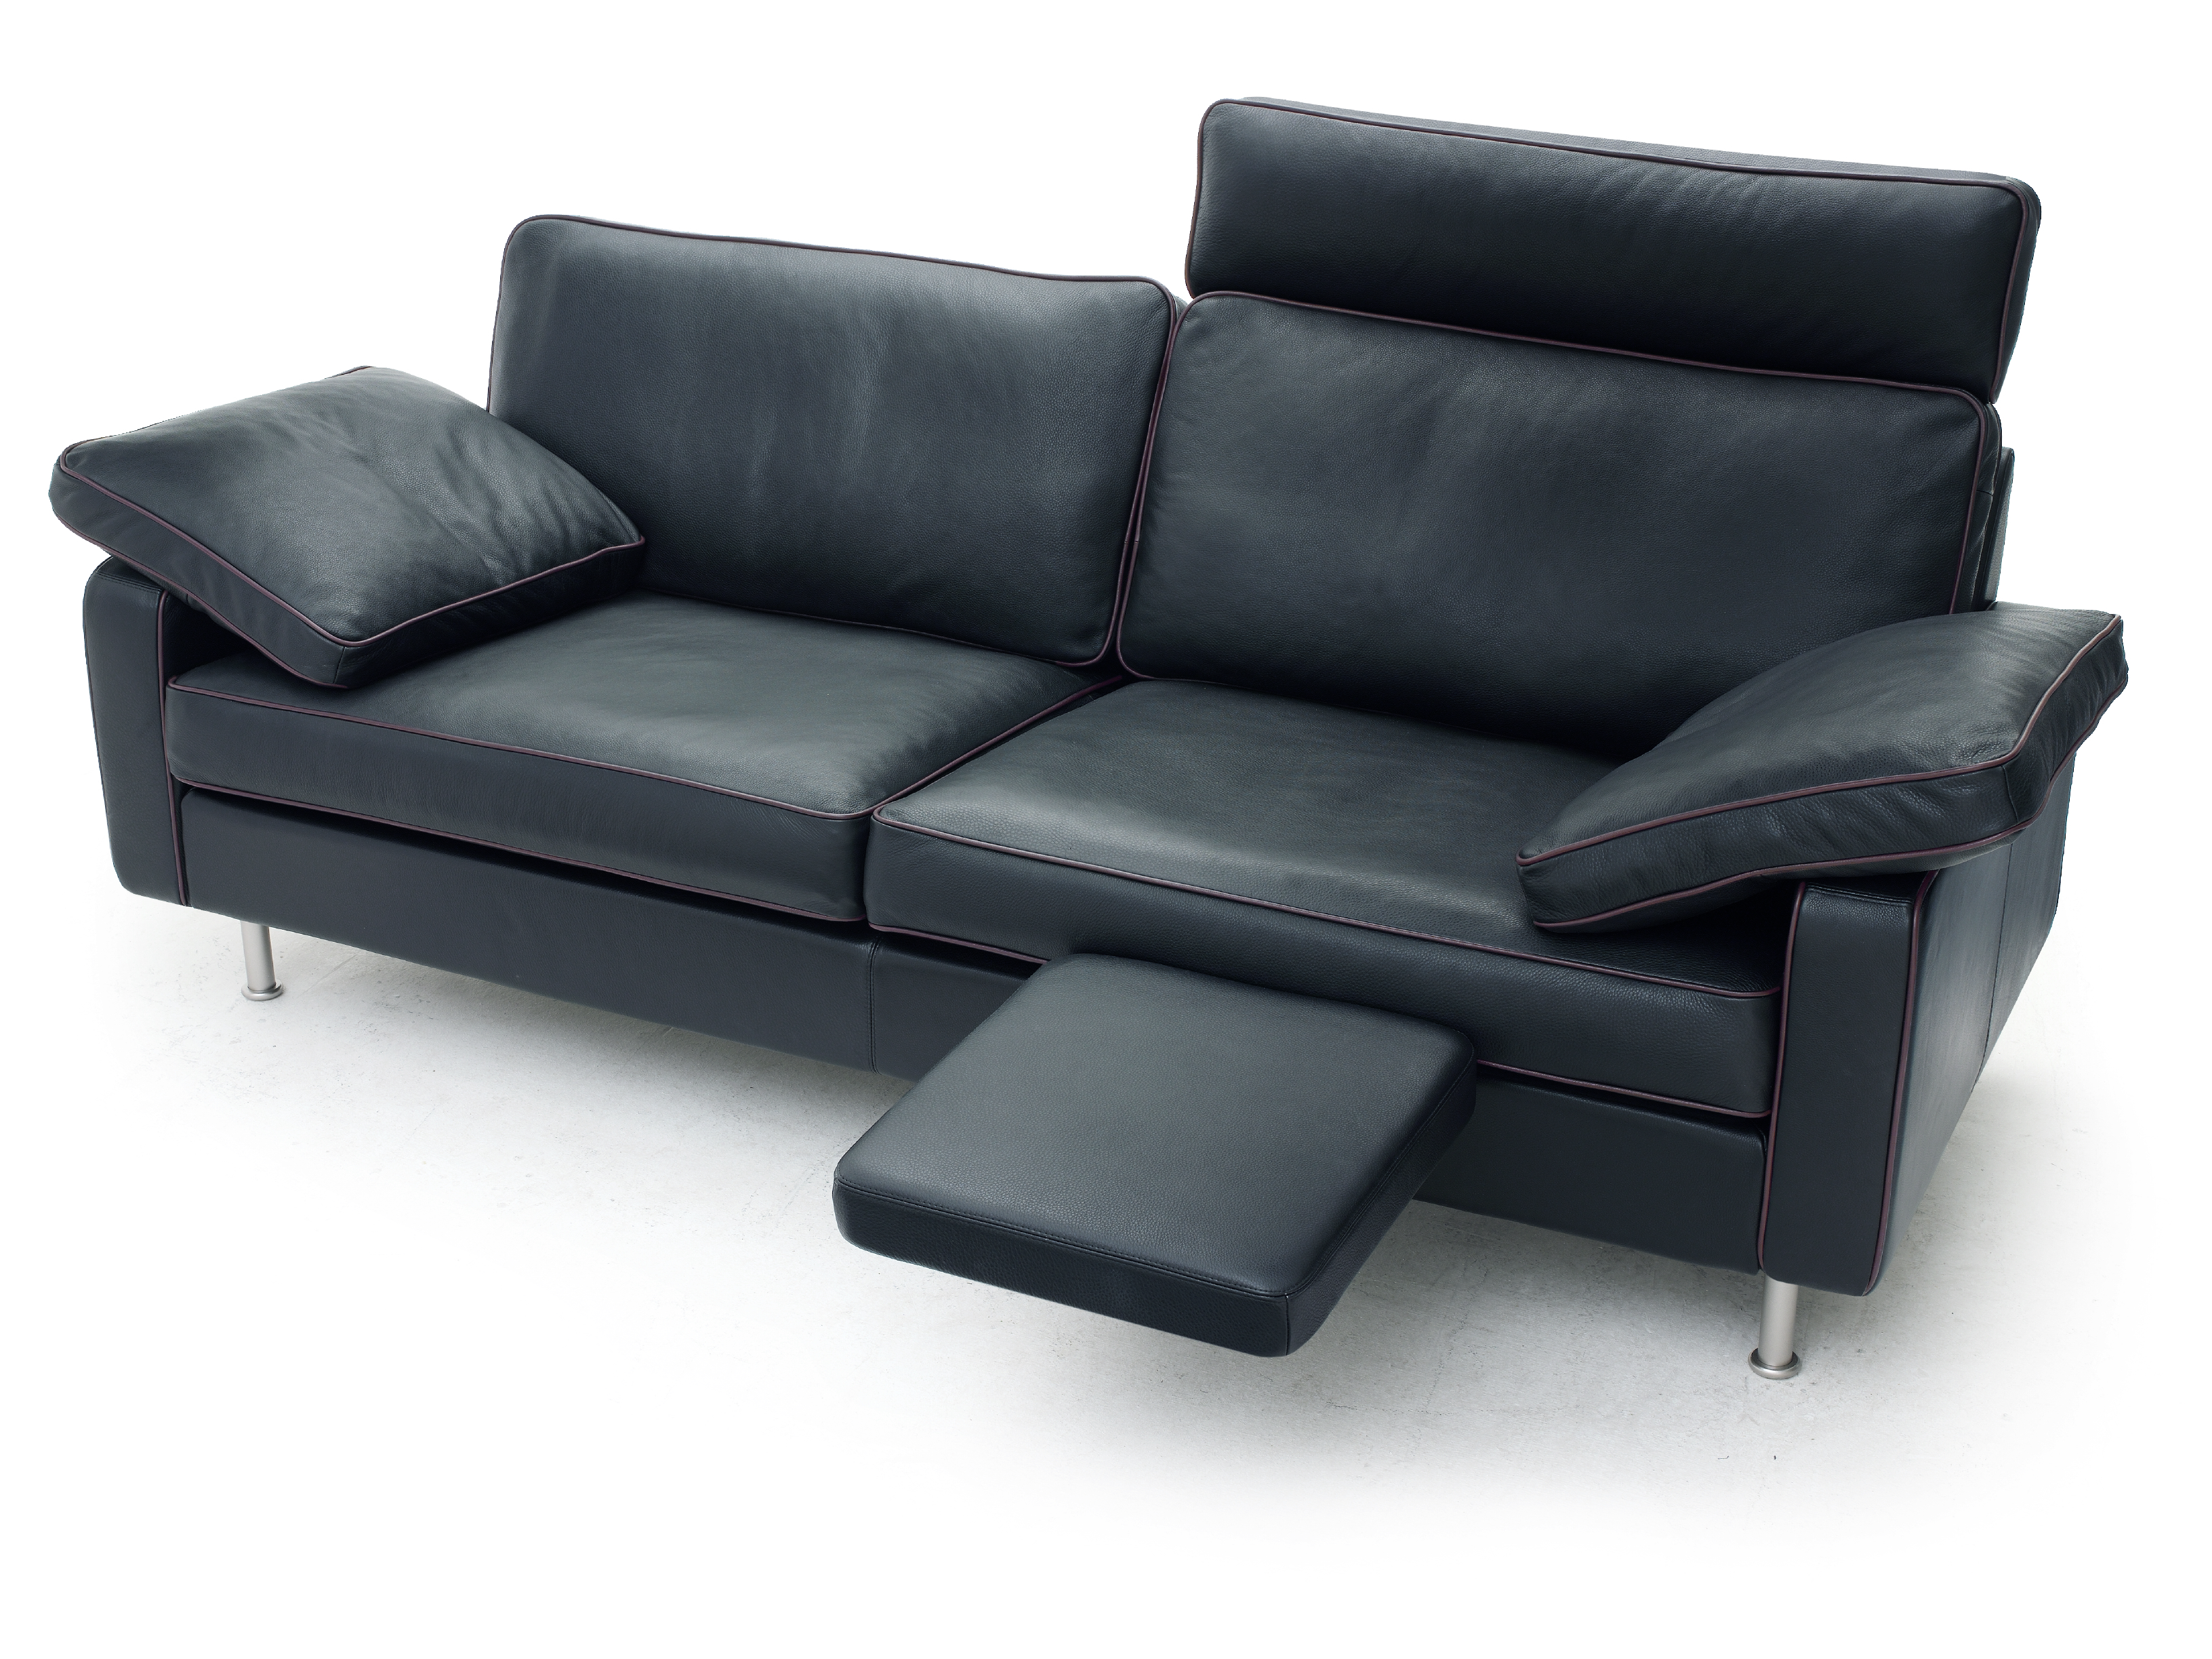 cor conseta jan luppes interieurs melles interieur. Black Bedroom Furniture Sets. Home Design Ideas